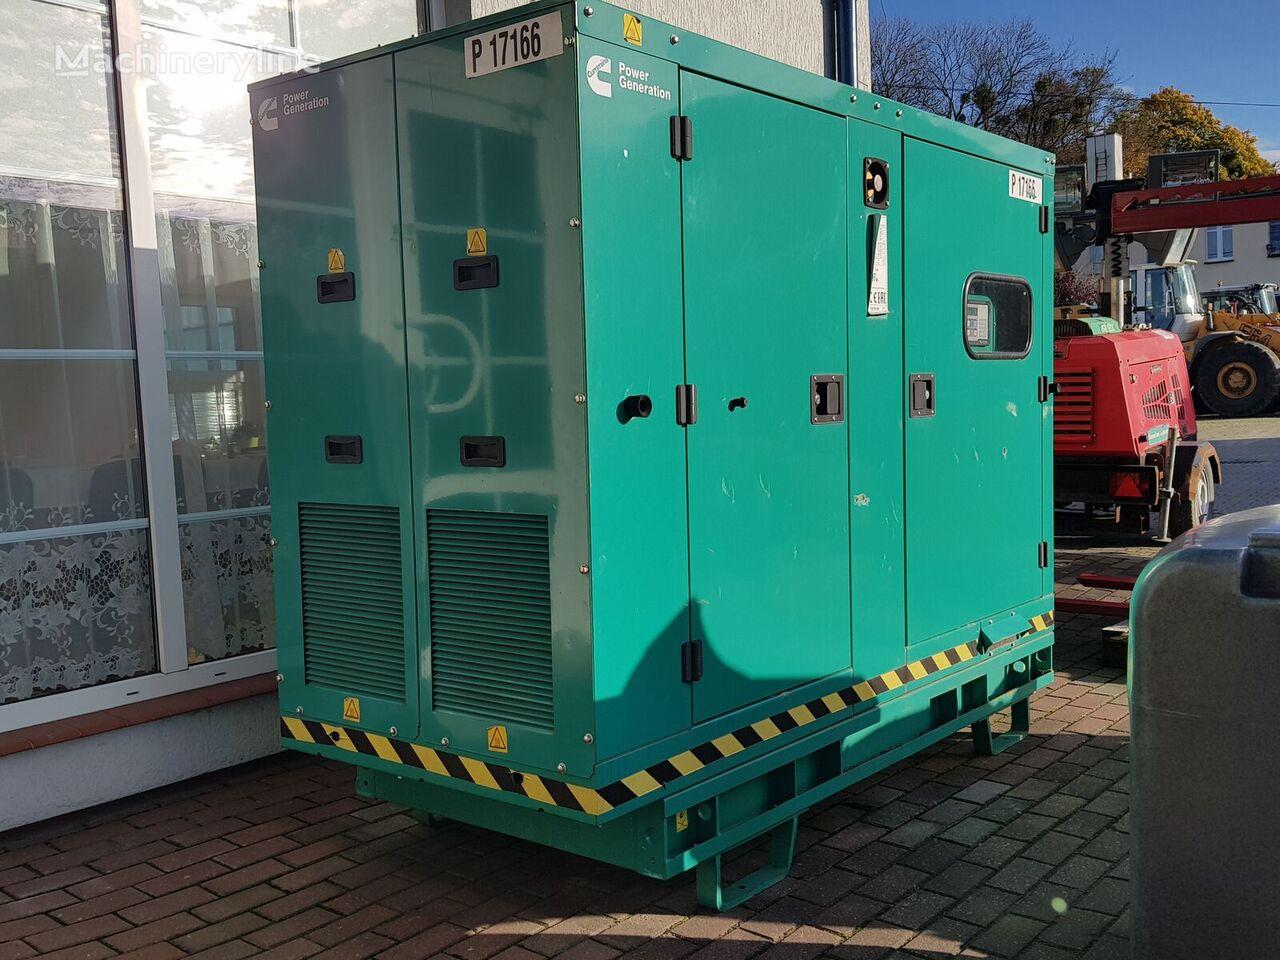 جديد مولد كهربائي يعمل بالديزل CUMMINS C55D5E